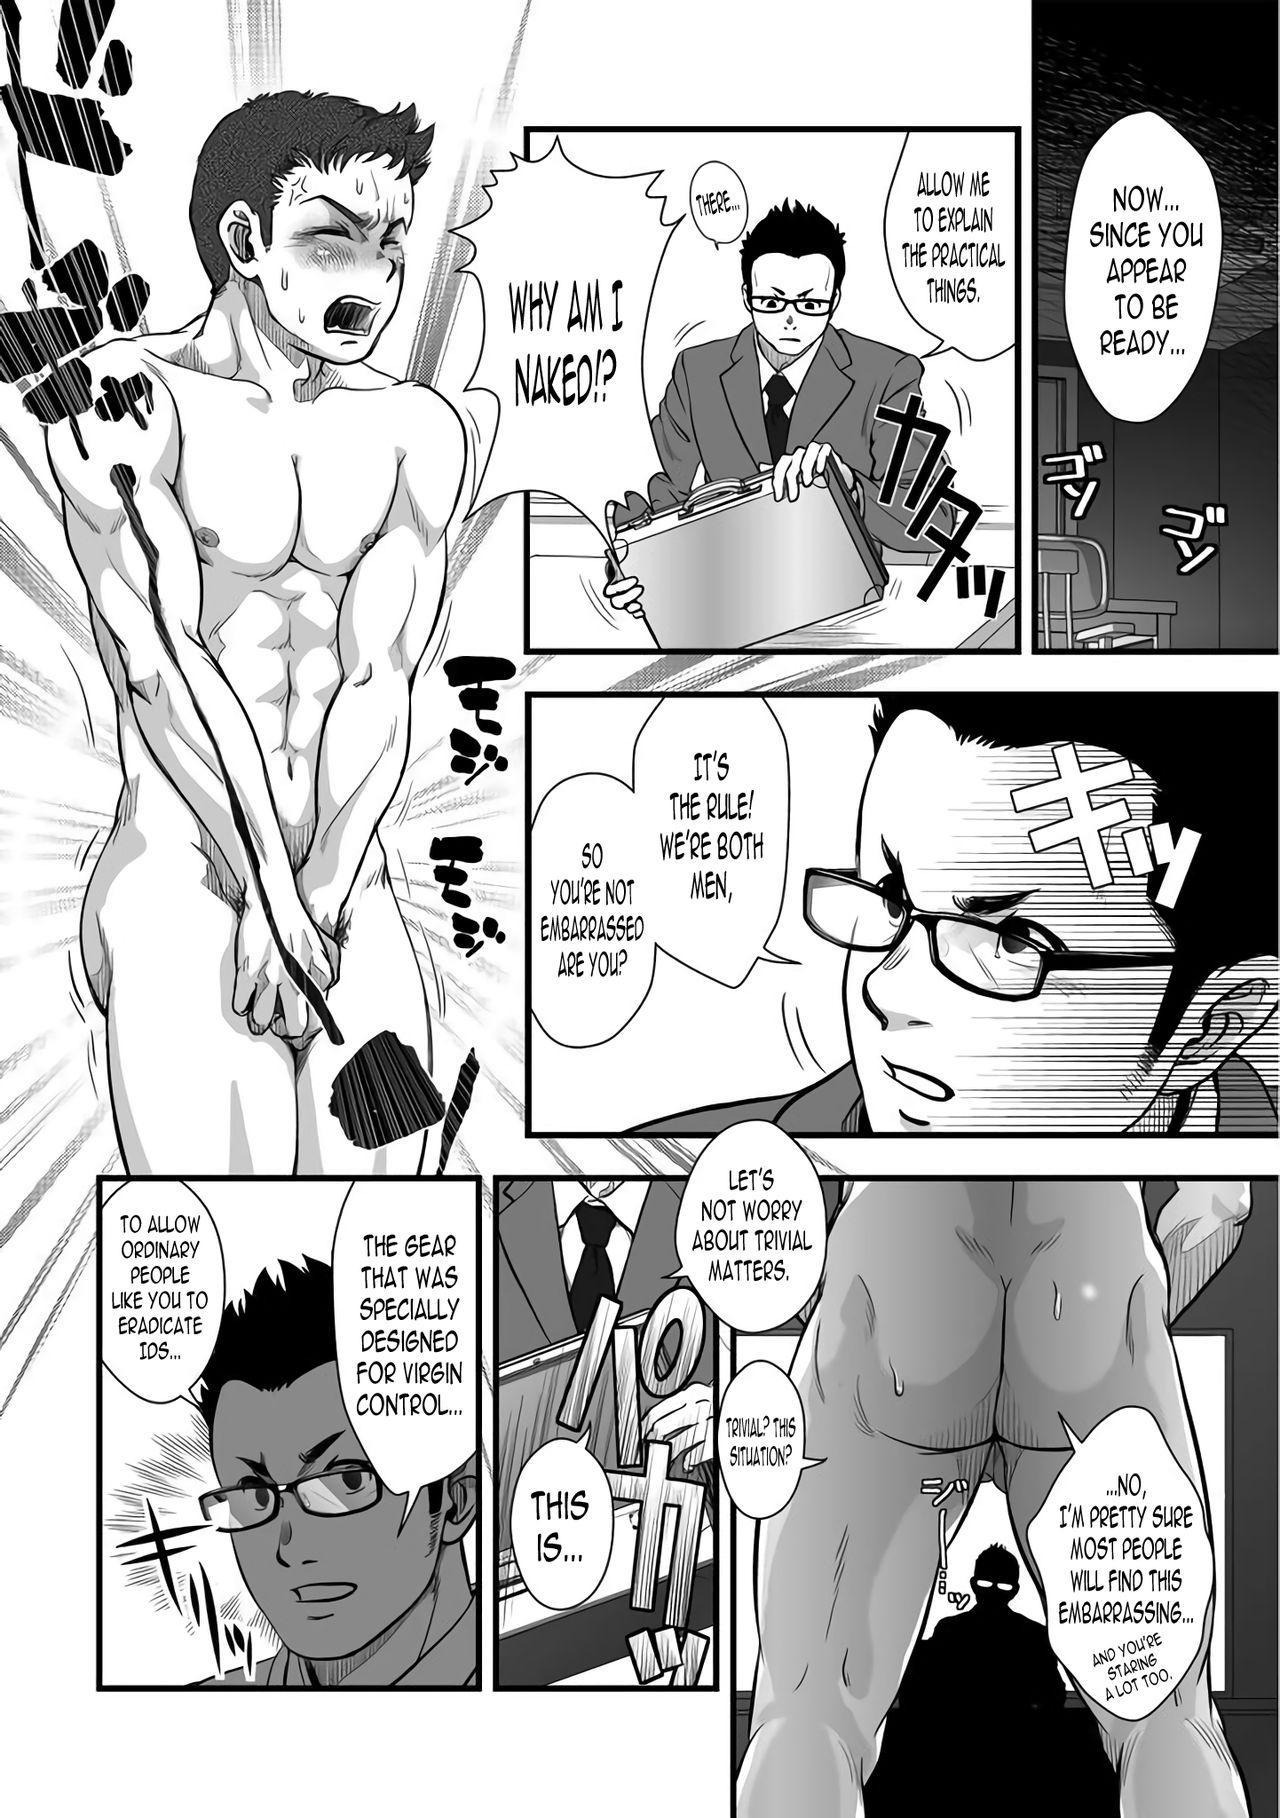 [Pagumiee (Kenta)] Tatakae!+++ (Plus-san)!! [English] [N04h] [Digital] 13